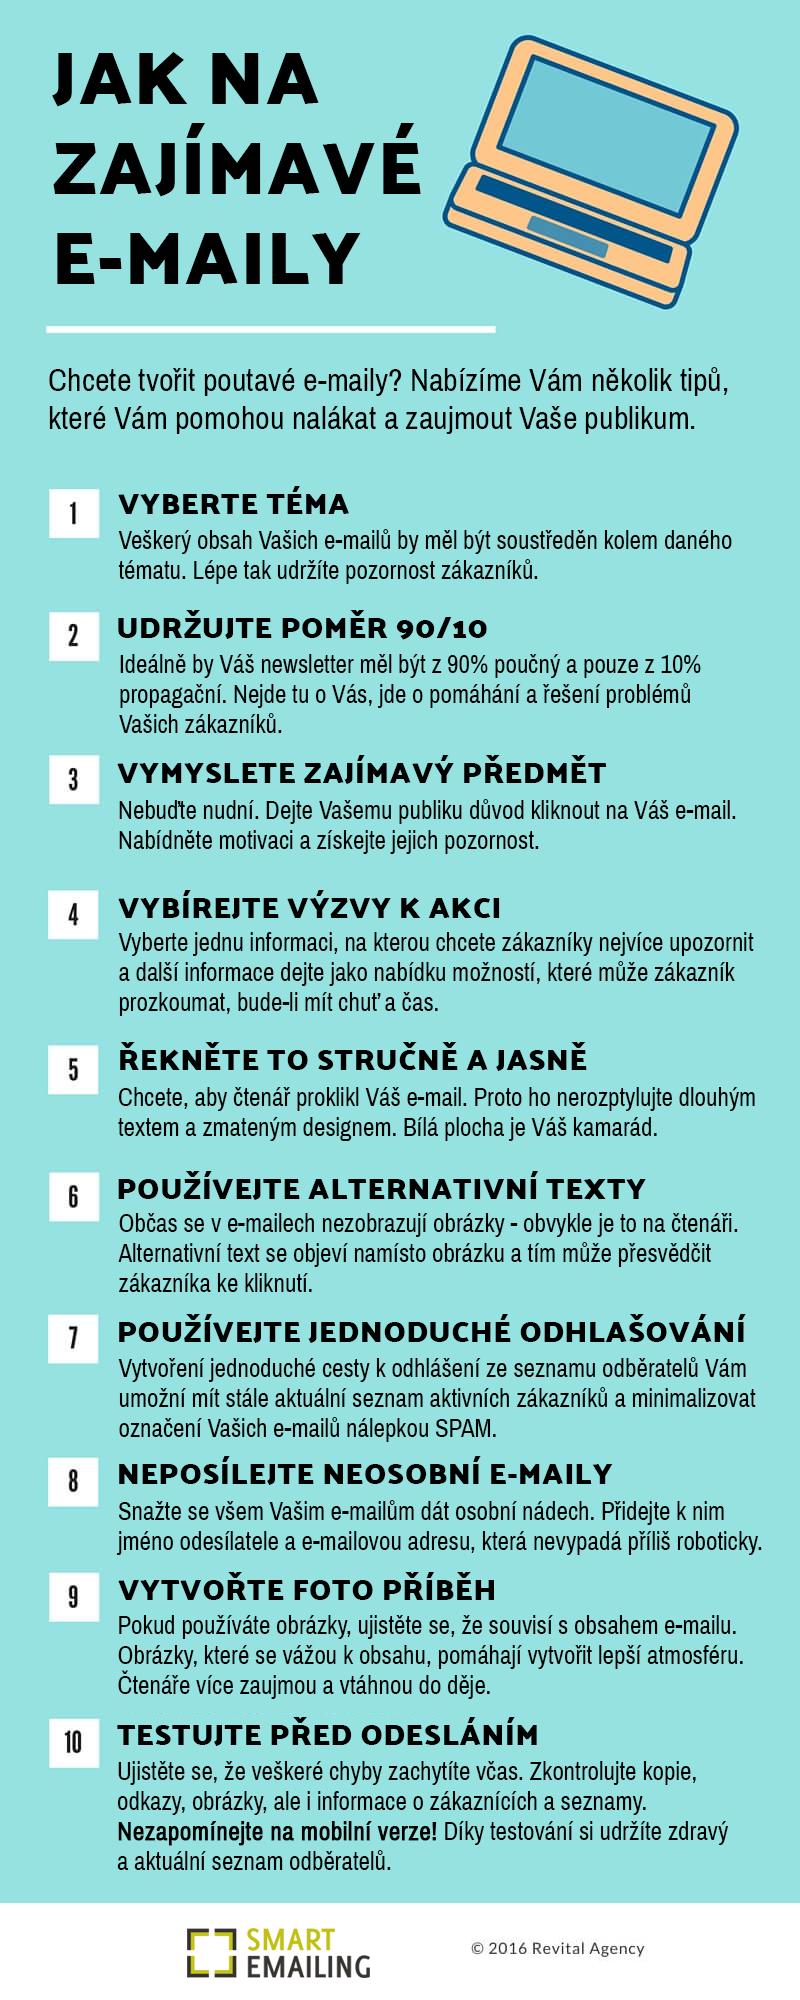 JakNaZajimaveEmaily